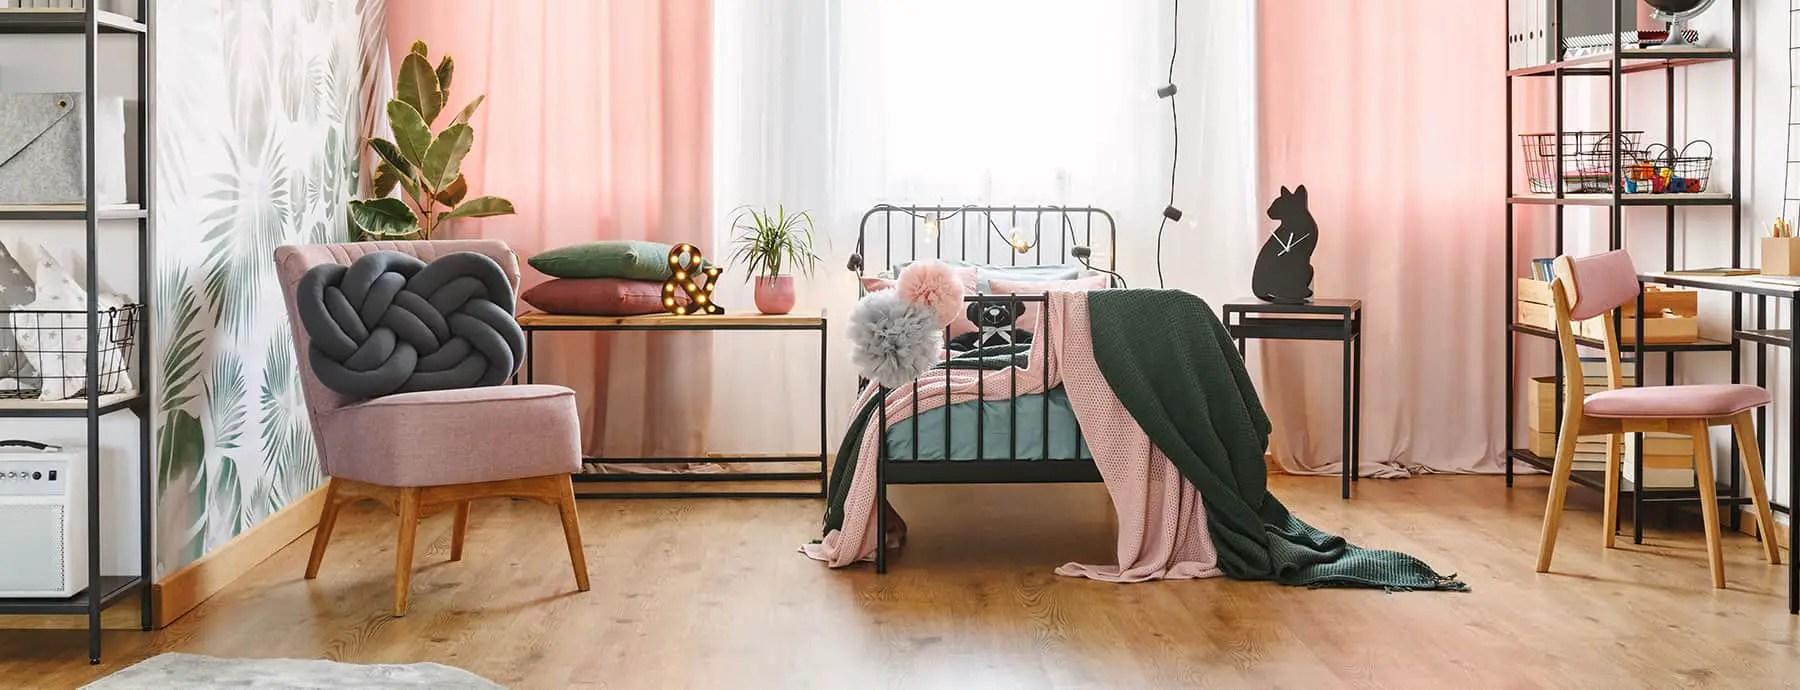 4 Helpful Organization Ideas For Your Teenage Girl Bedroom Nursery Kid S Room Decor Ideas My Sleepy Monkey